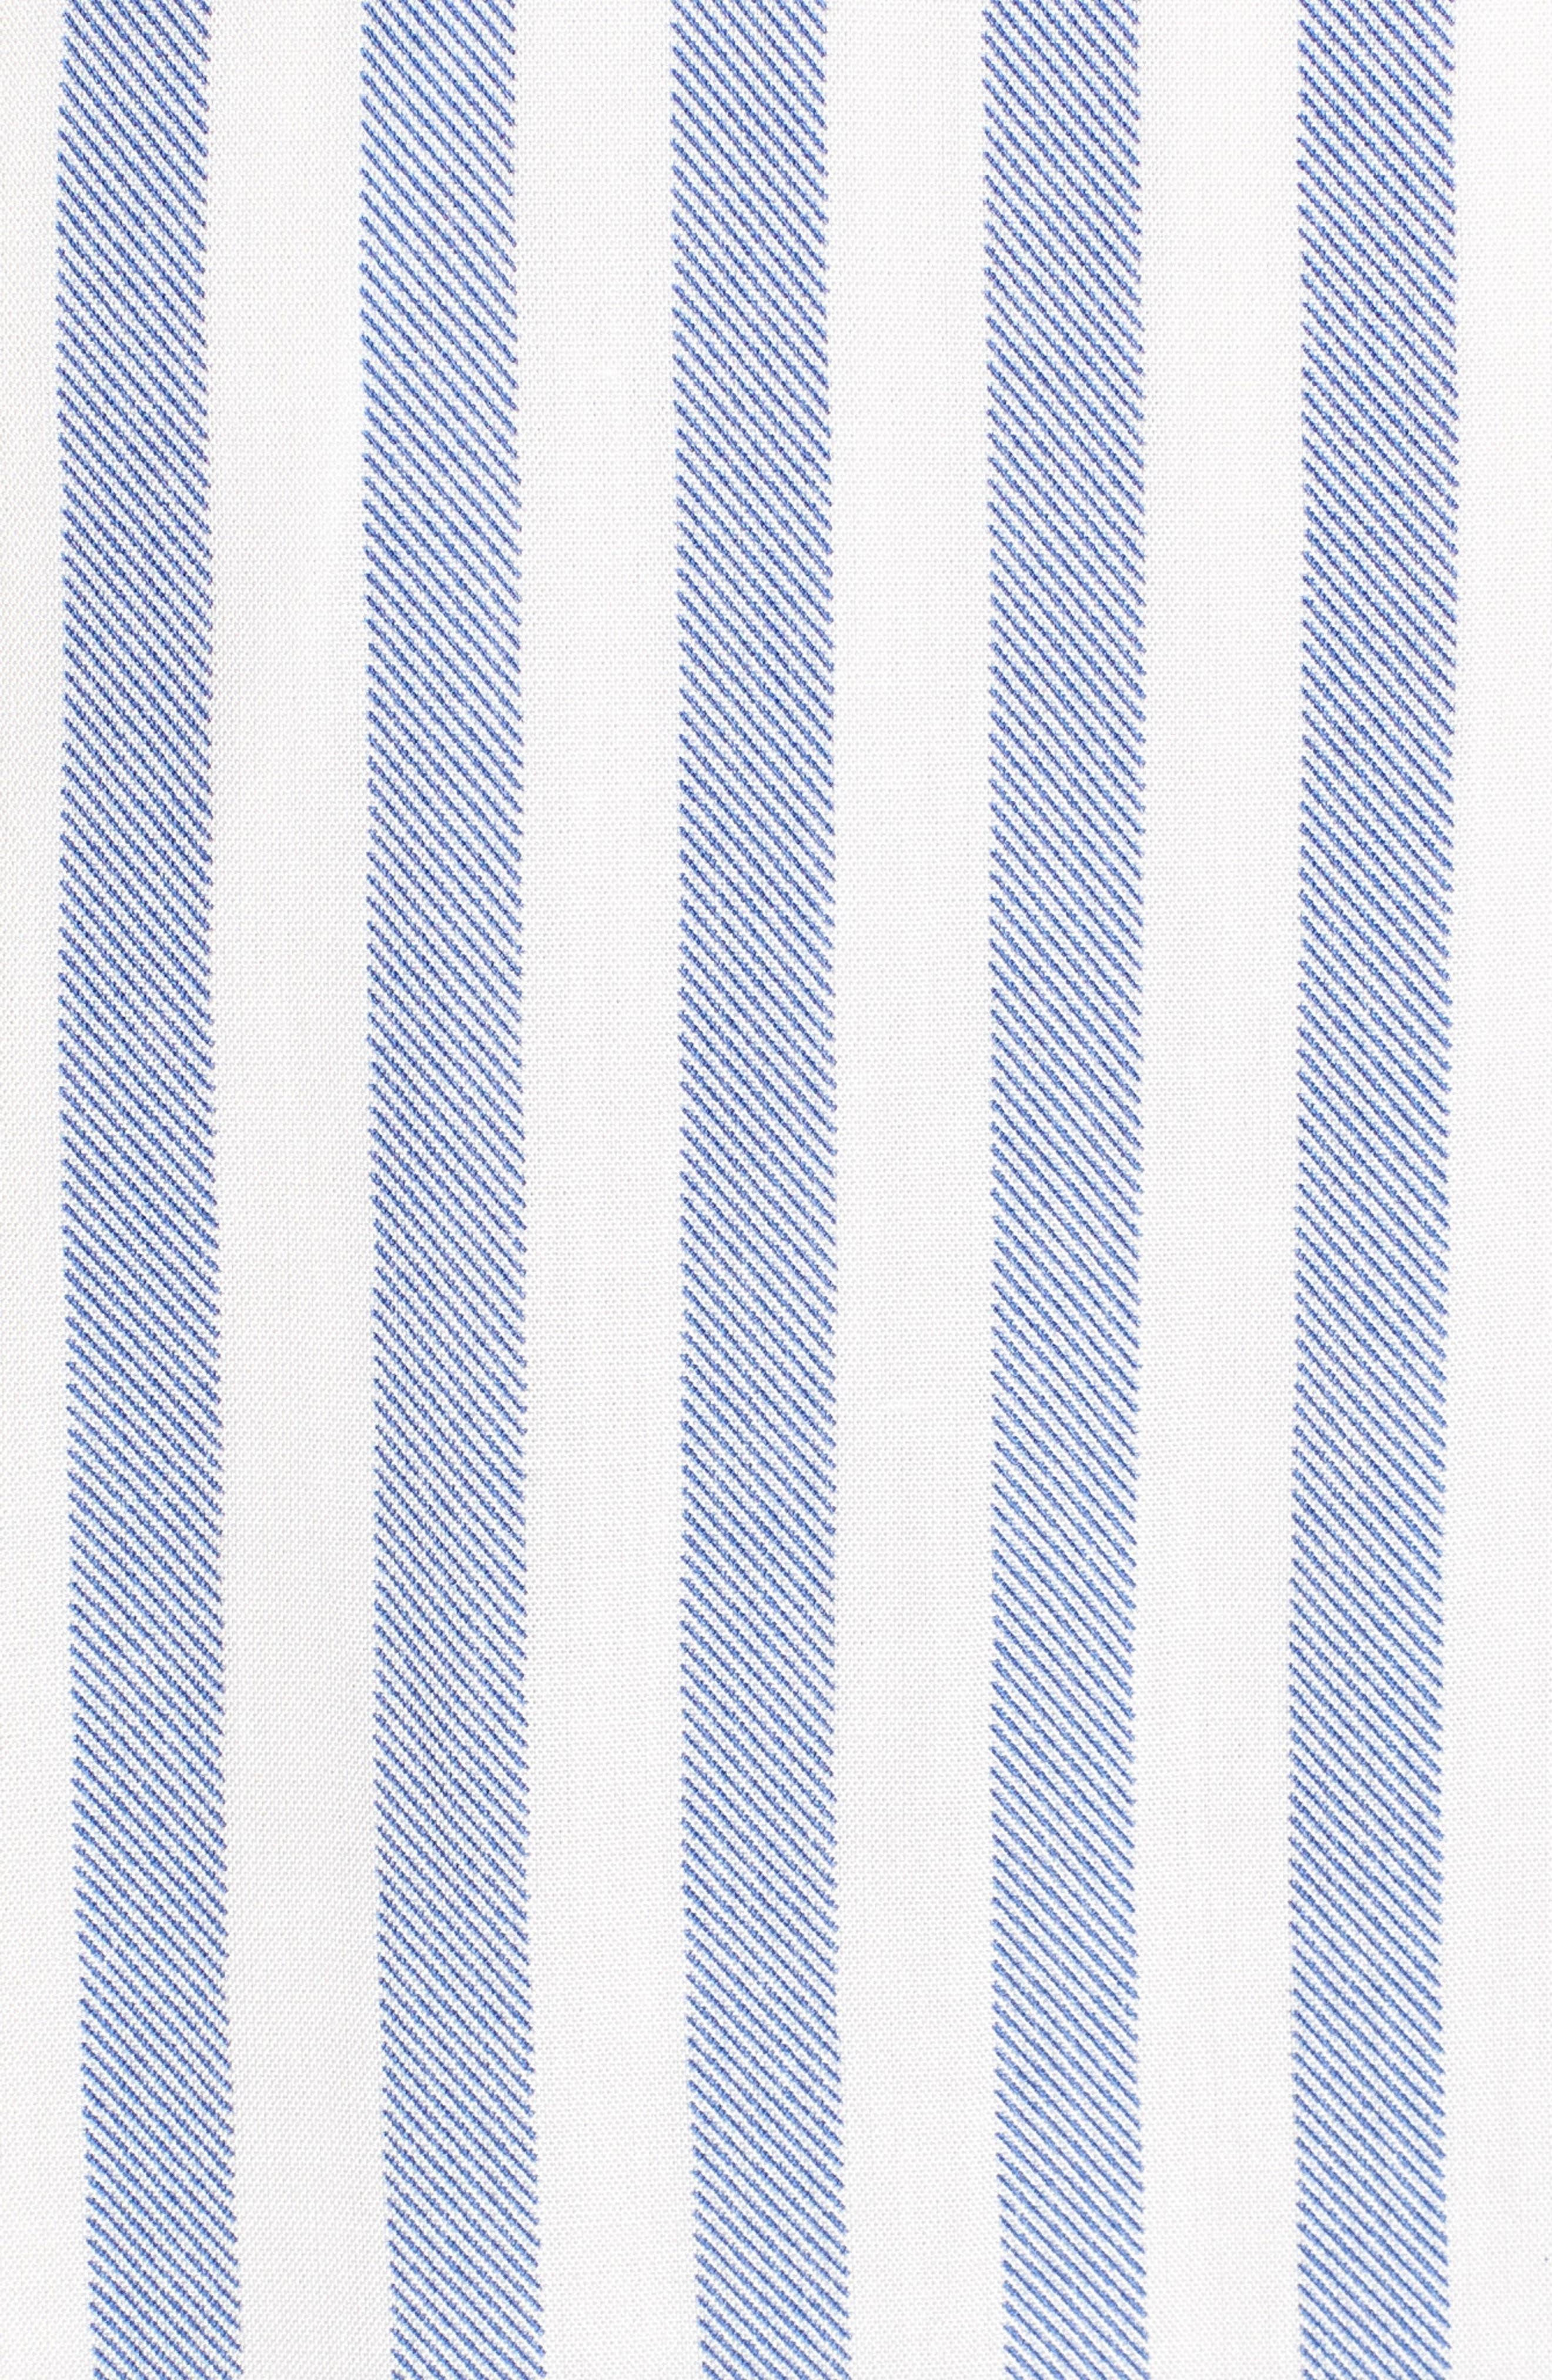 Bishop + Young Ana Stripe Shark Bite Hem Halter Dress,                             Alternate thumbnail 6, color,                             Blue White Stripe